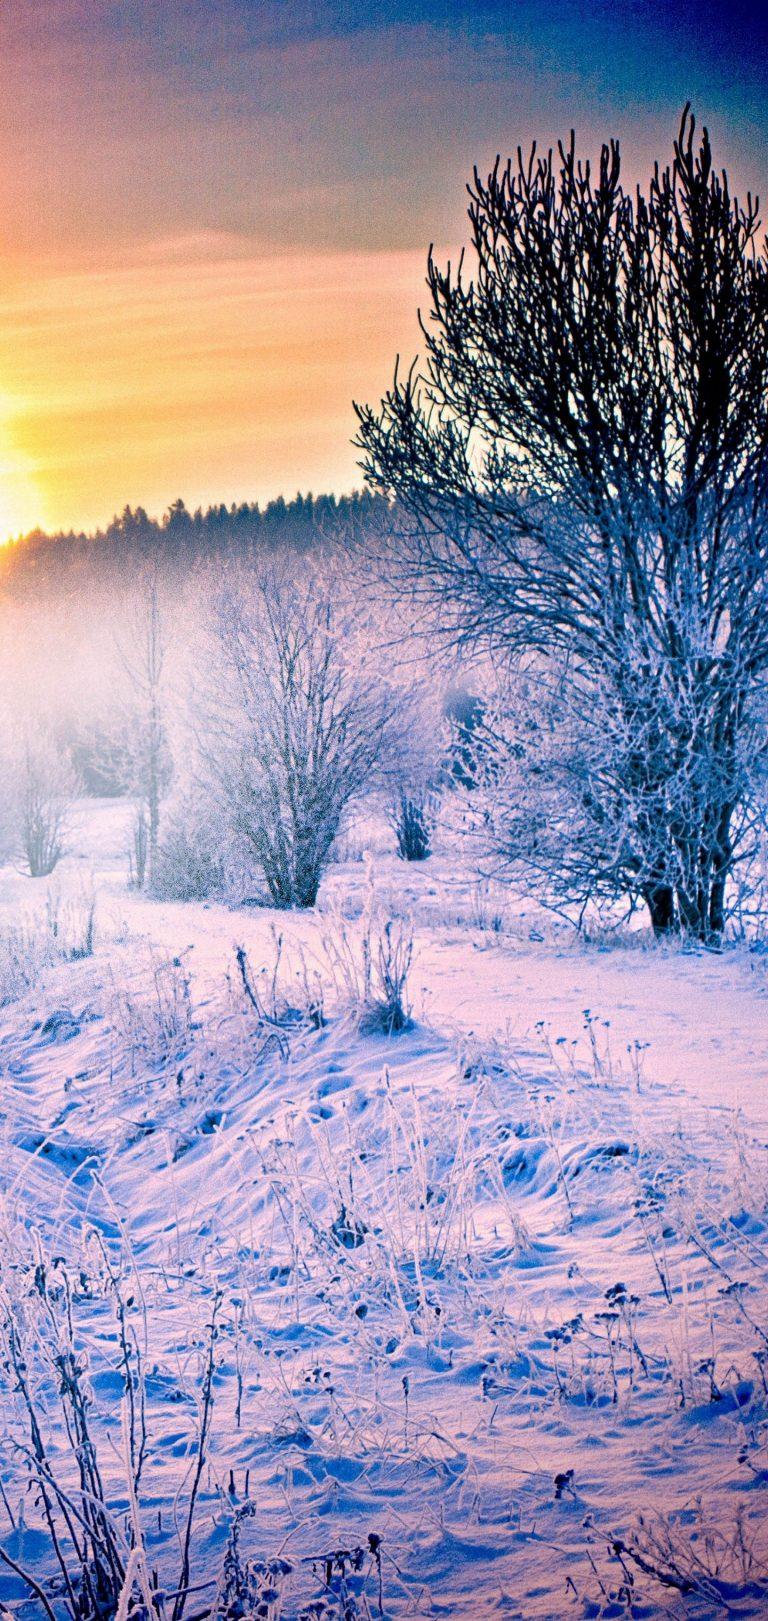 Winter Snow Forest Trail Wallpaper 1440x3040 768x1621